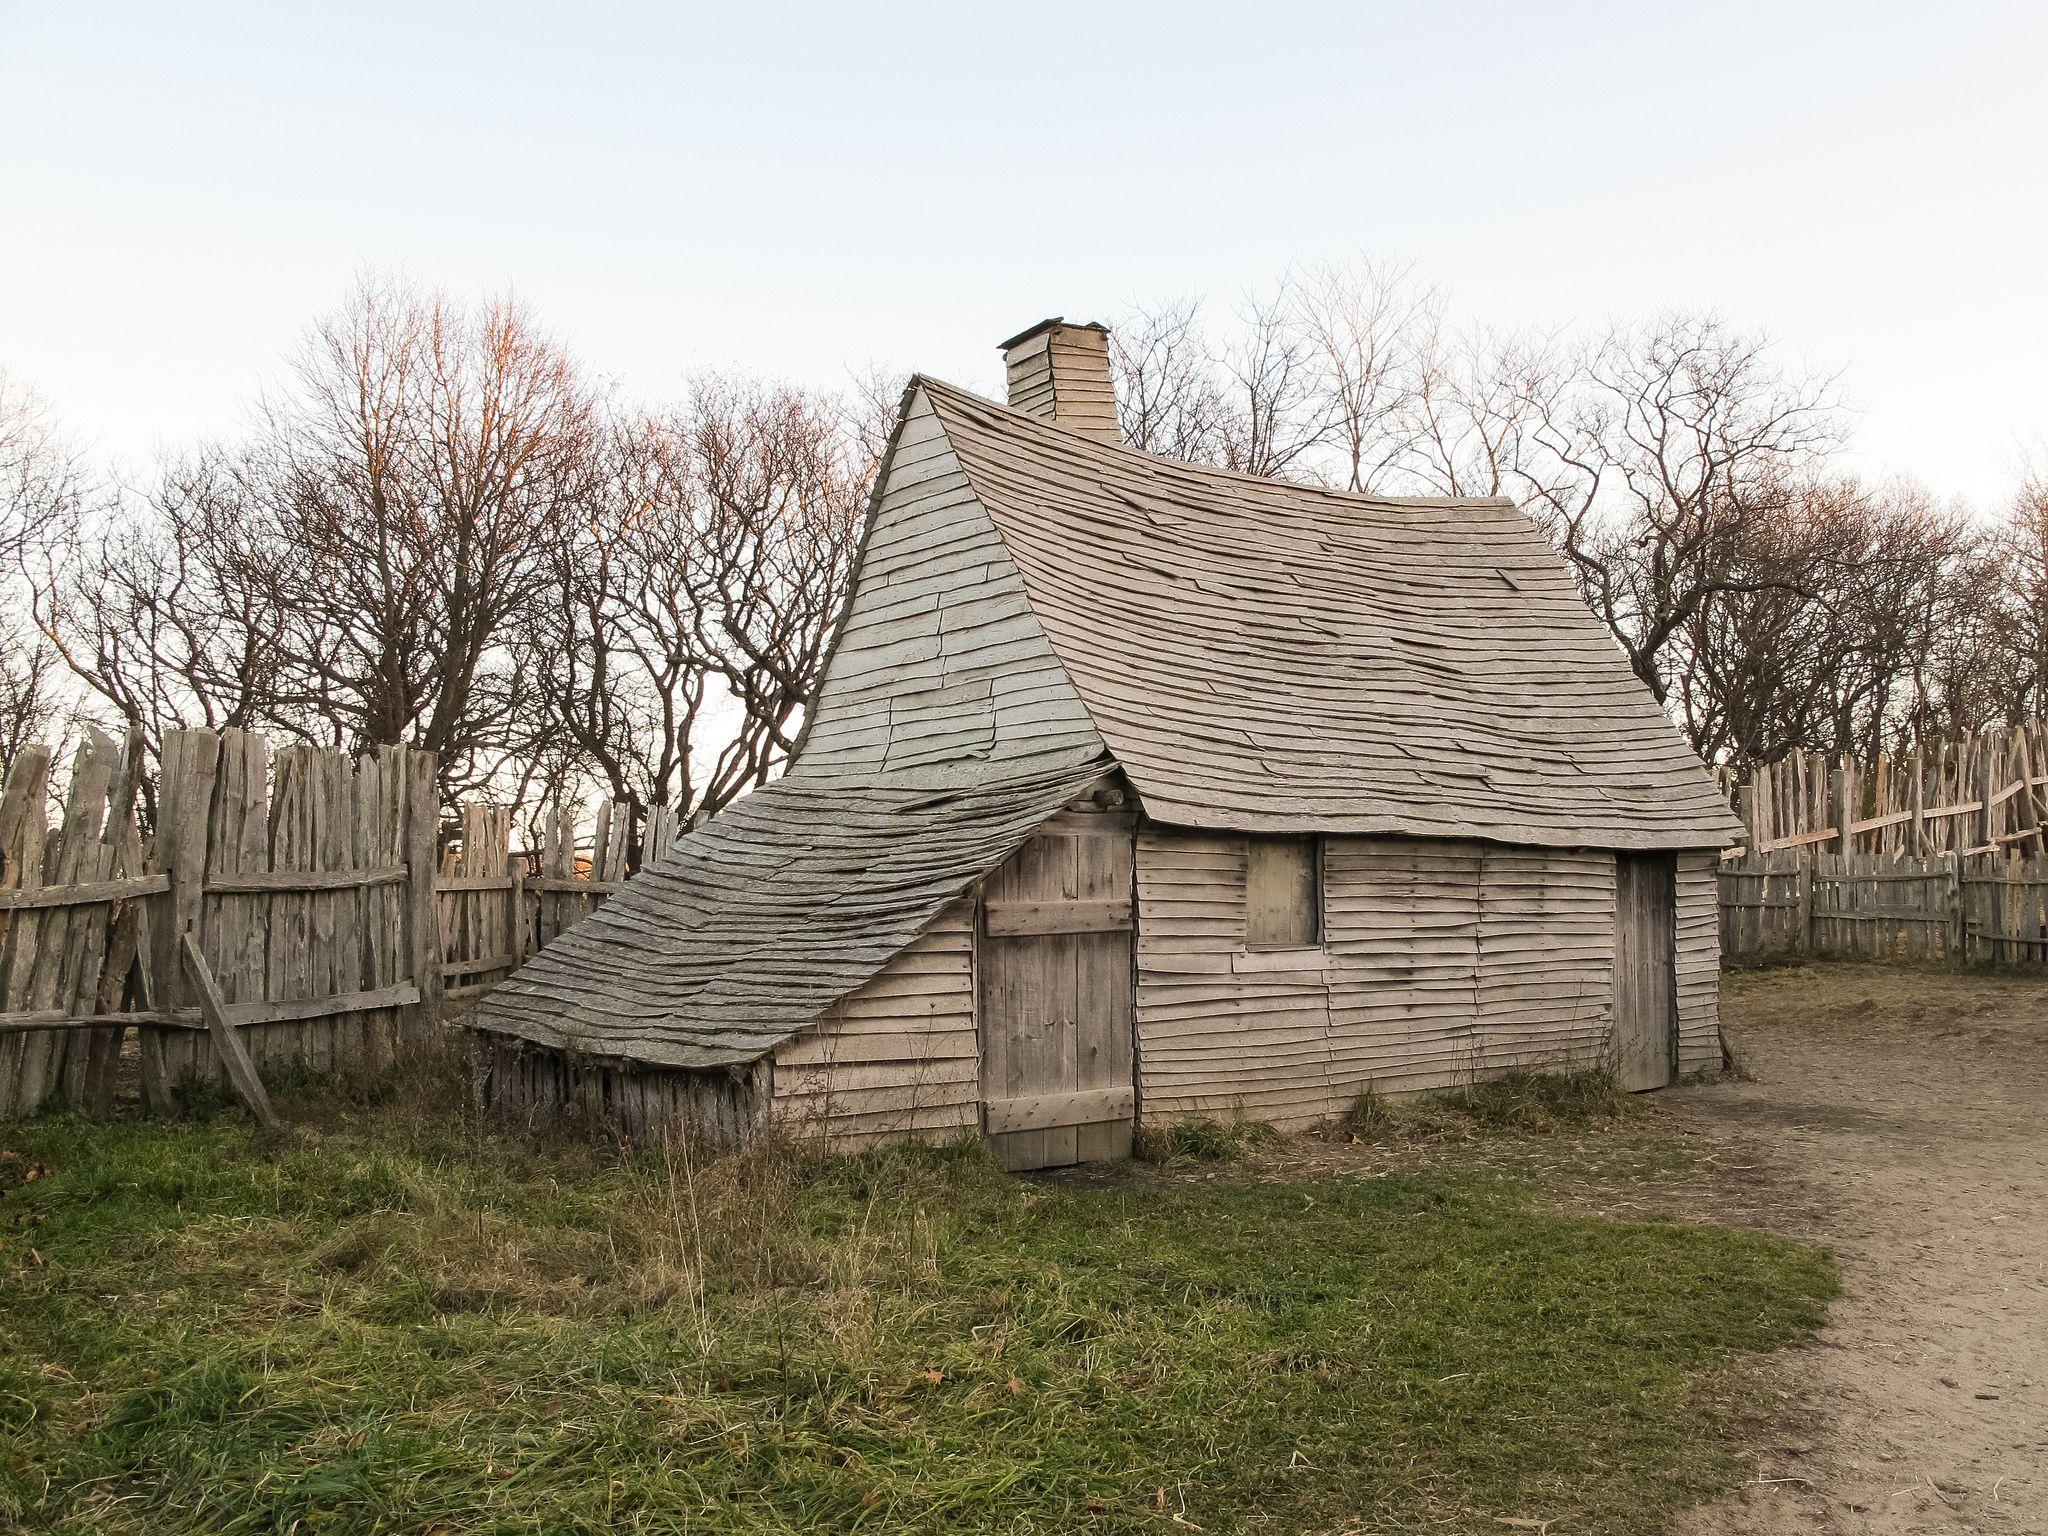 Plimoth Plantation settlement 17th Century in 2019